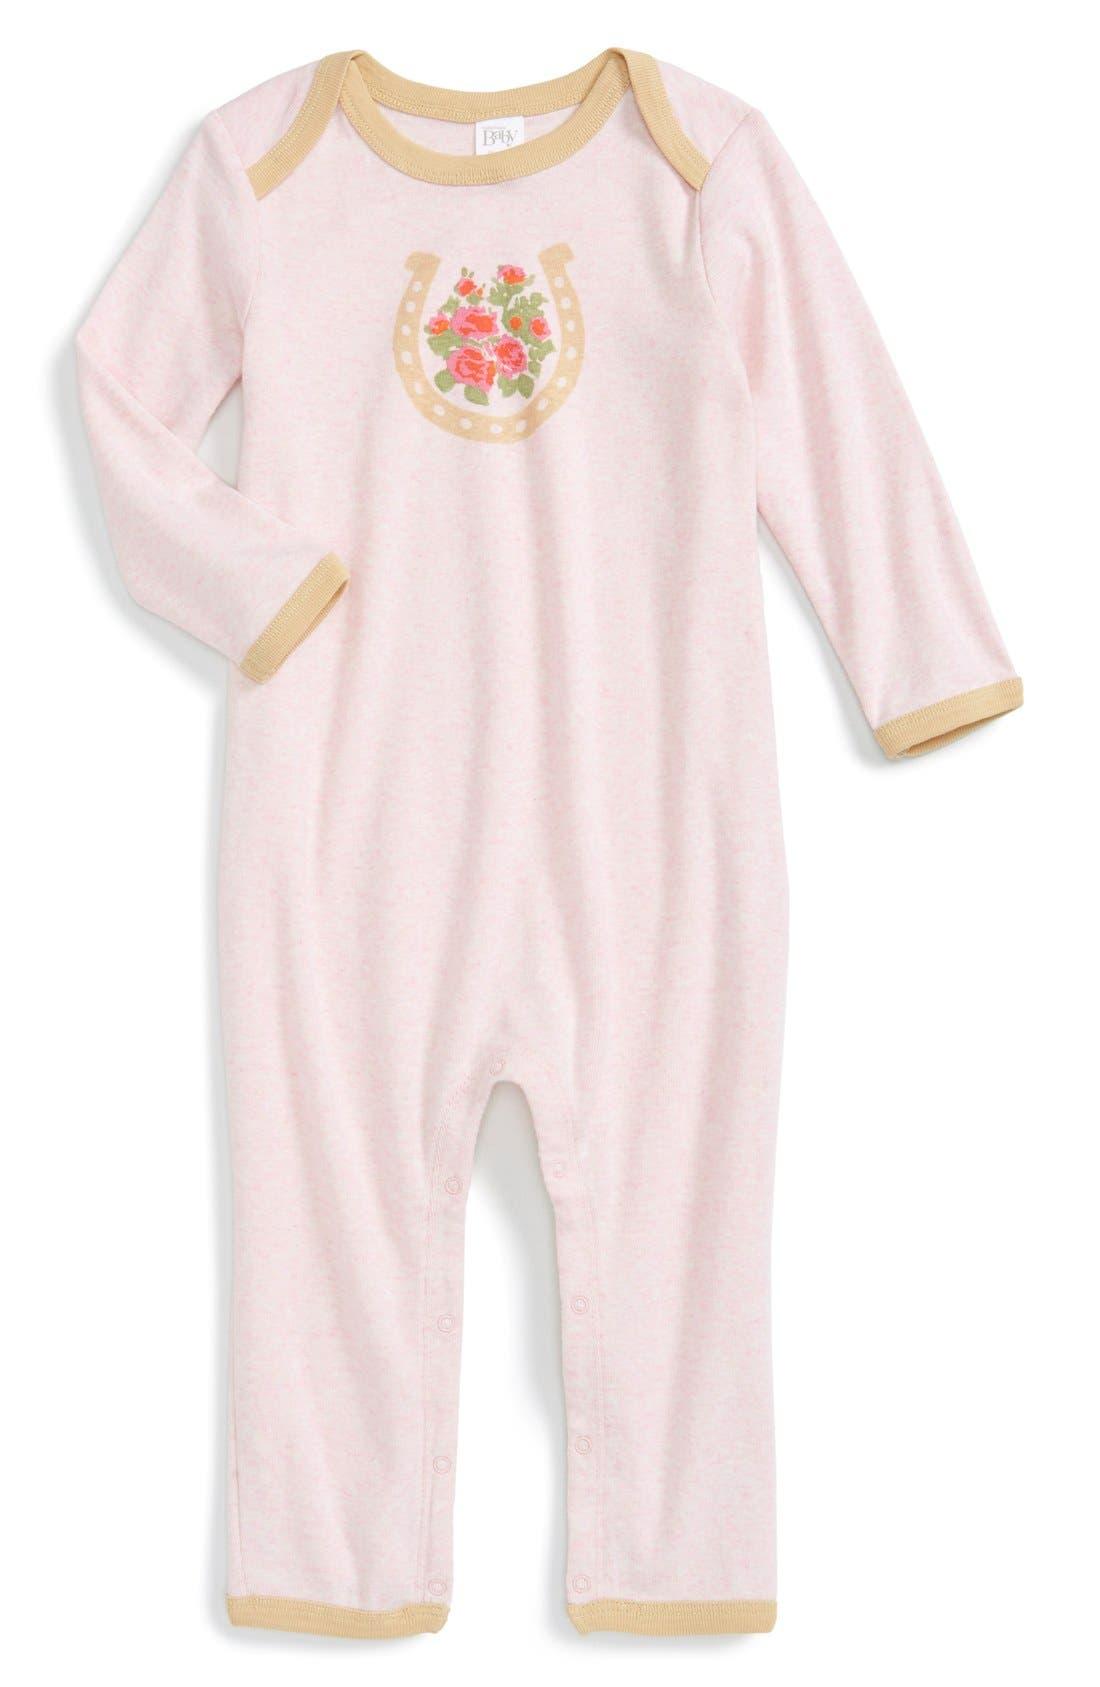 Main Image - Nordstrom Baby Graphic Romper (Baby Girls)